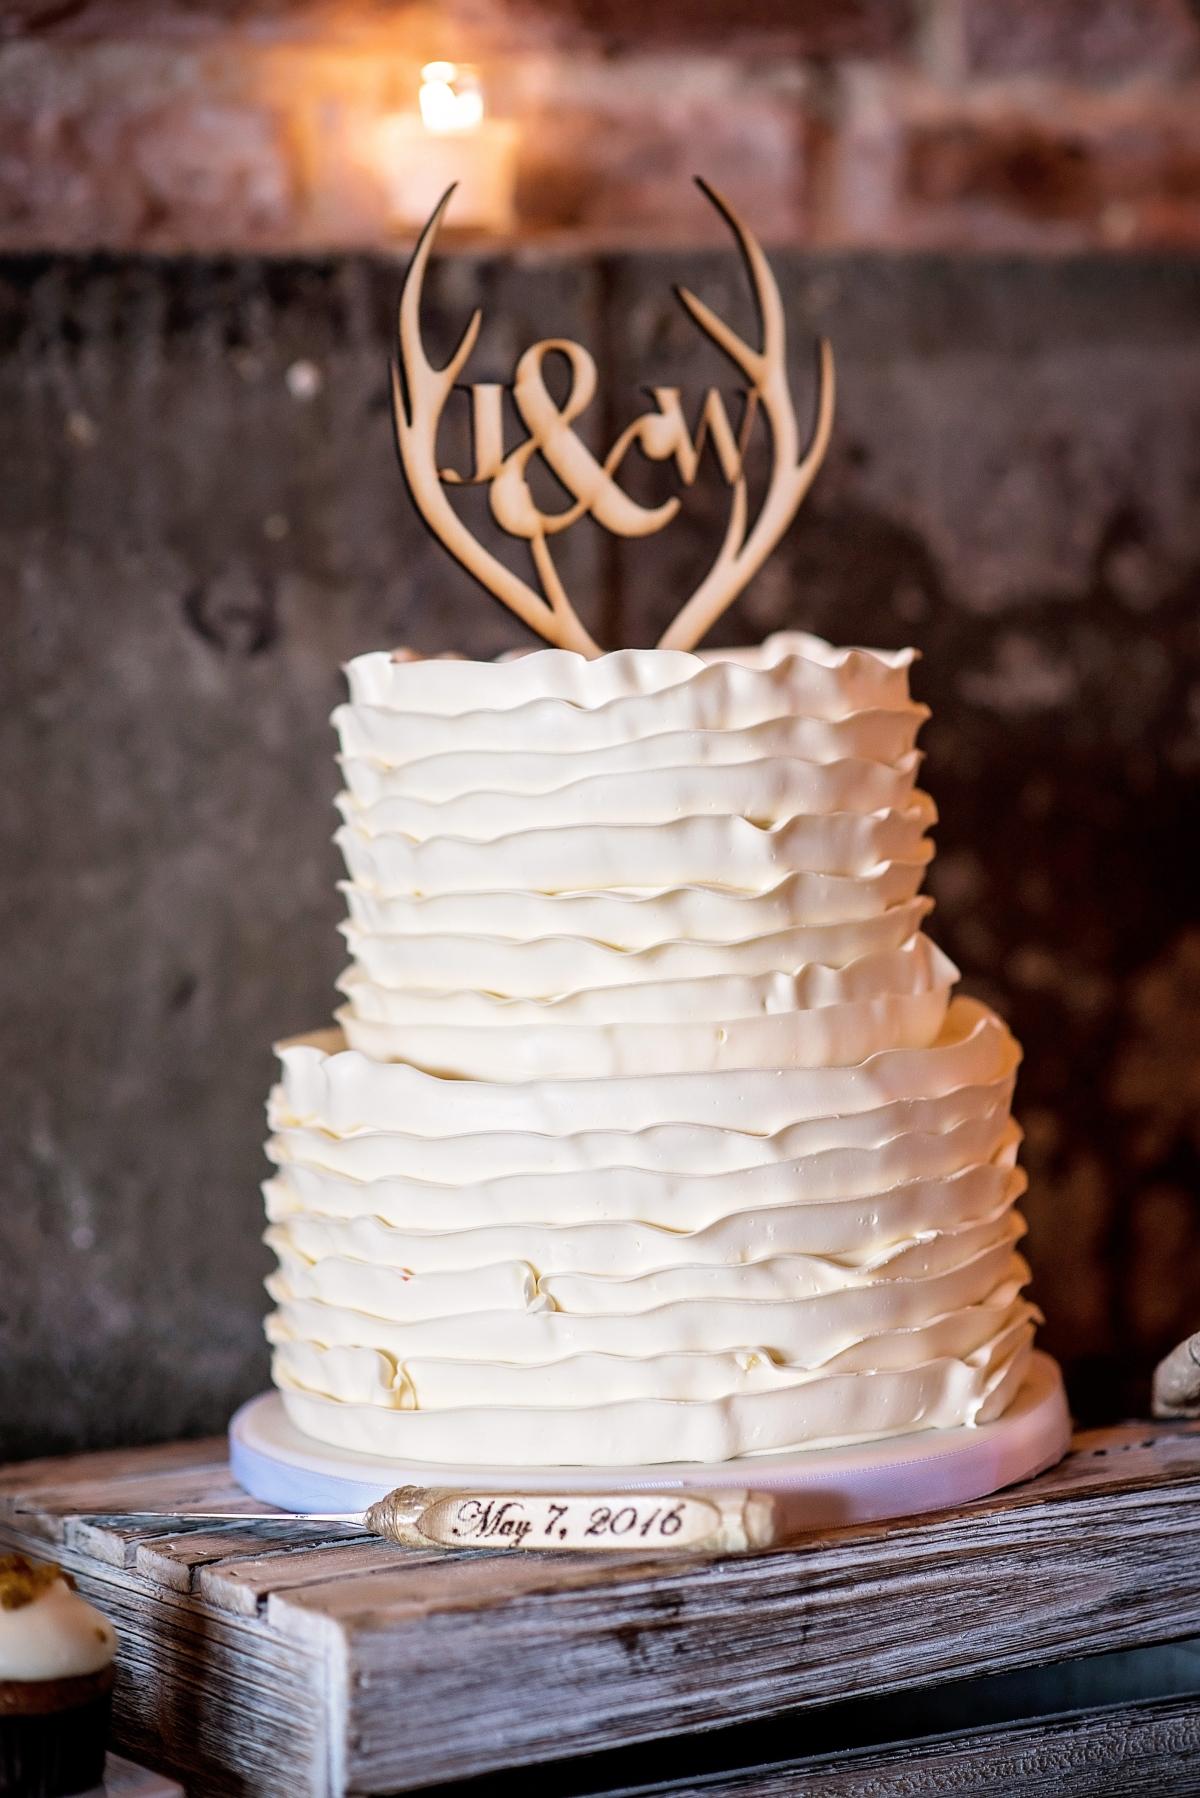 Wedding Cake with Ruffled Icing